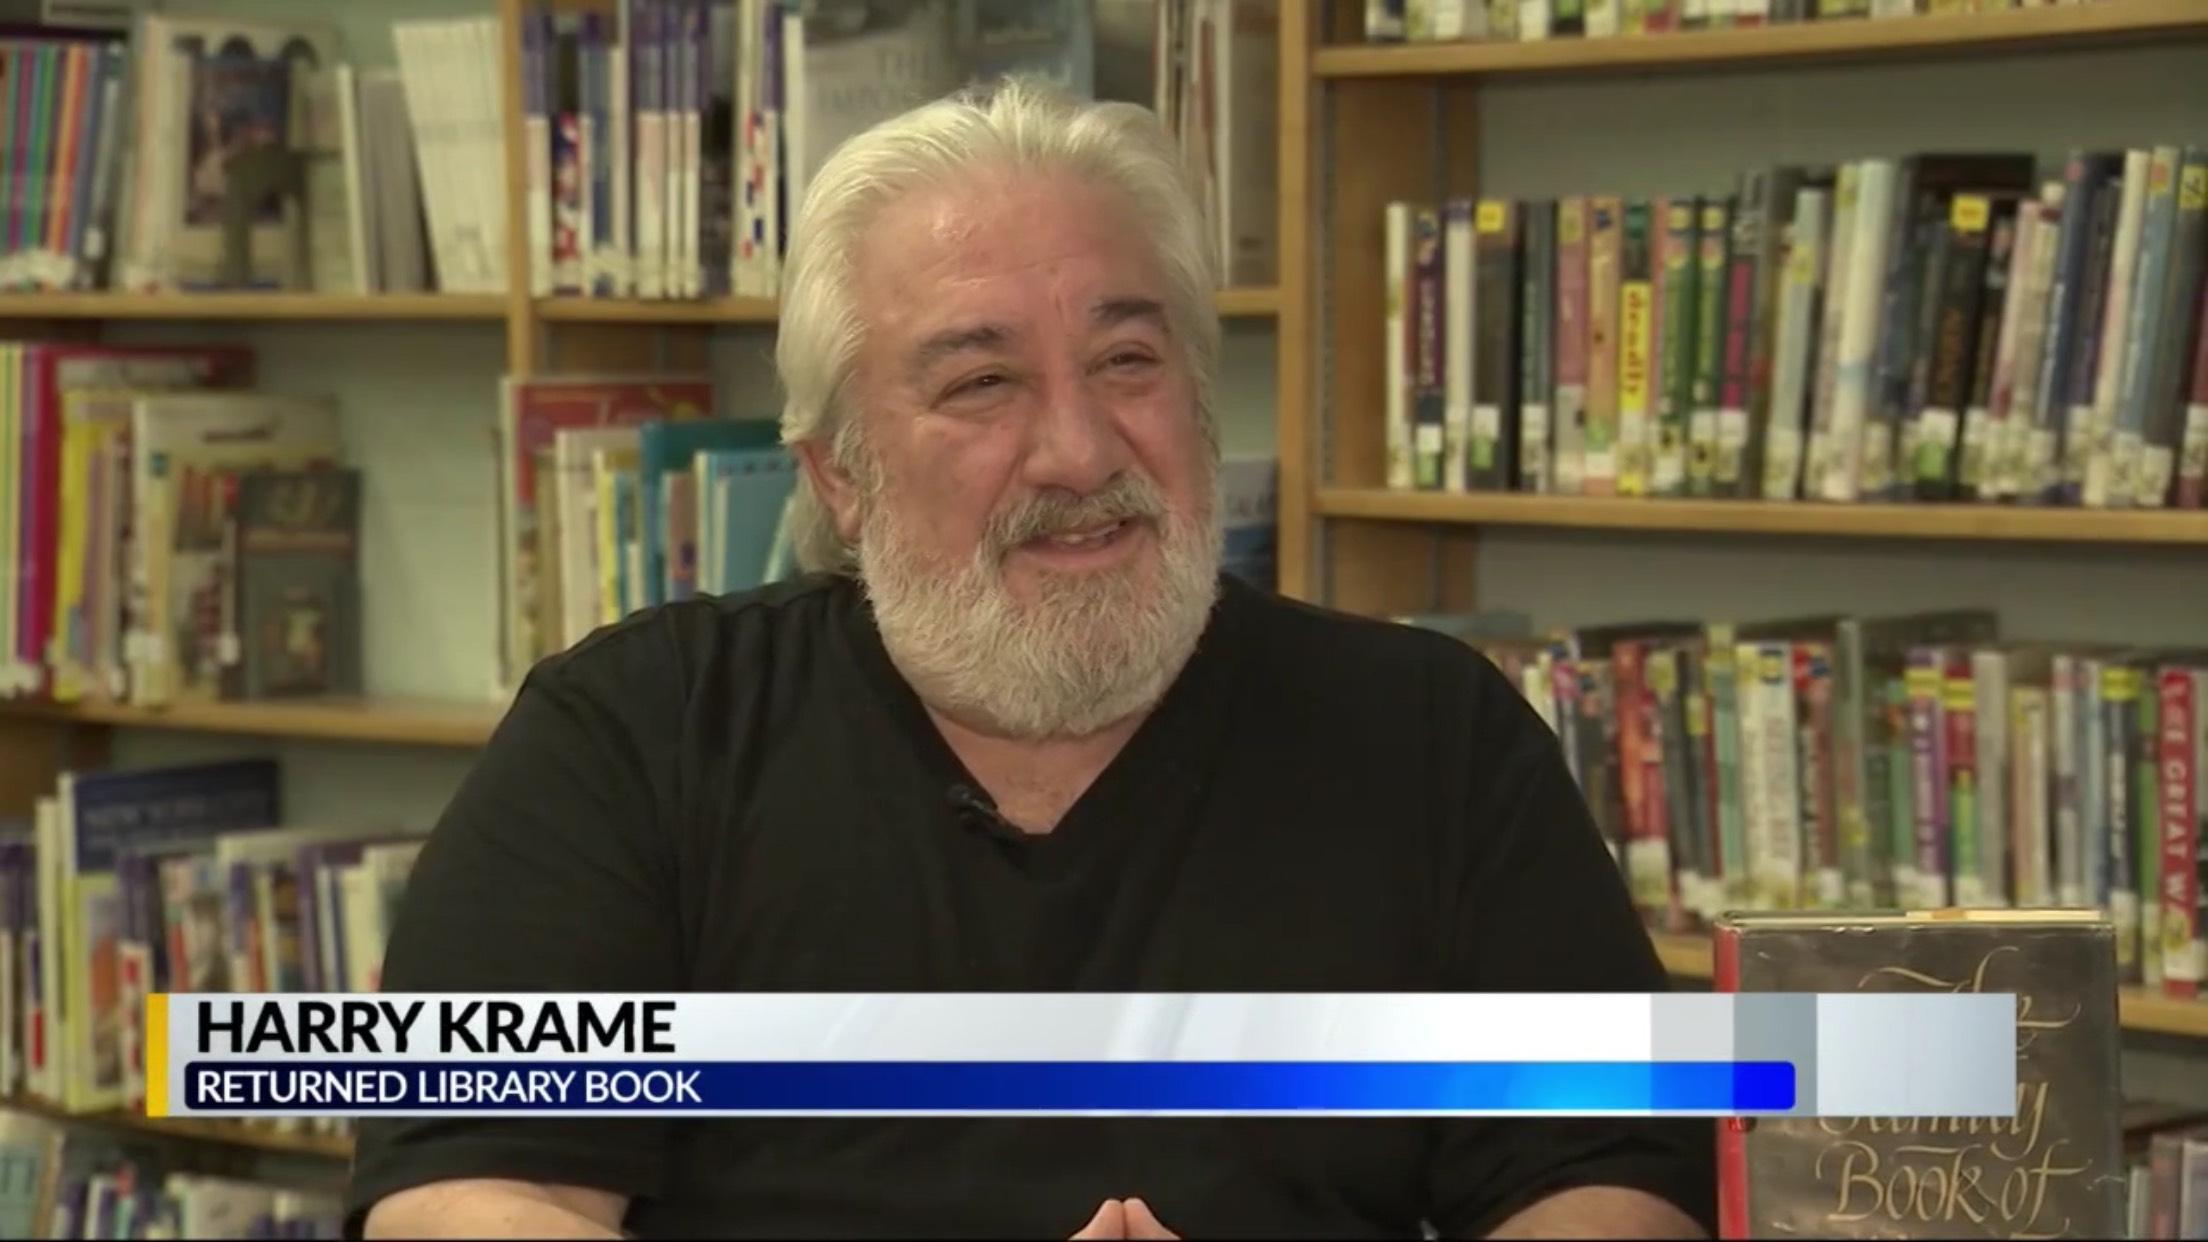 Harry Krame: Returned Library Book